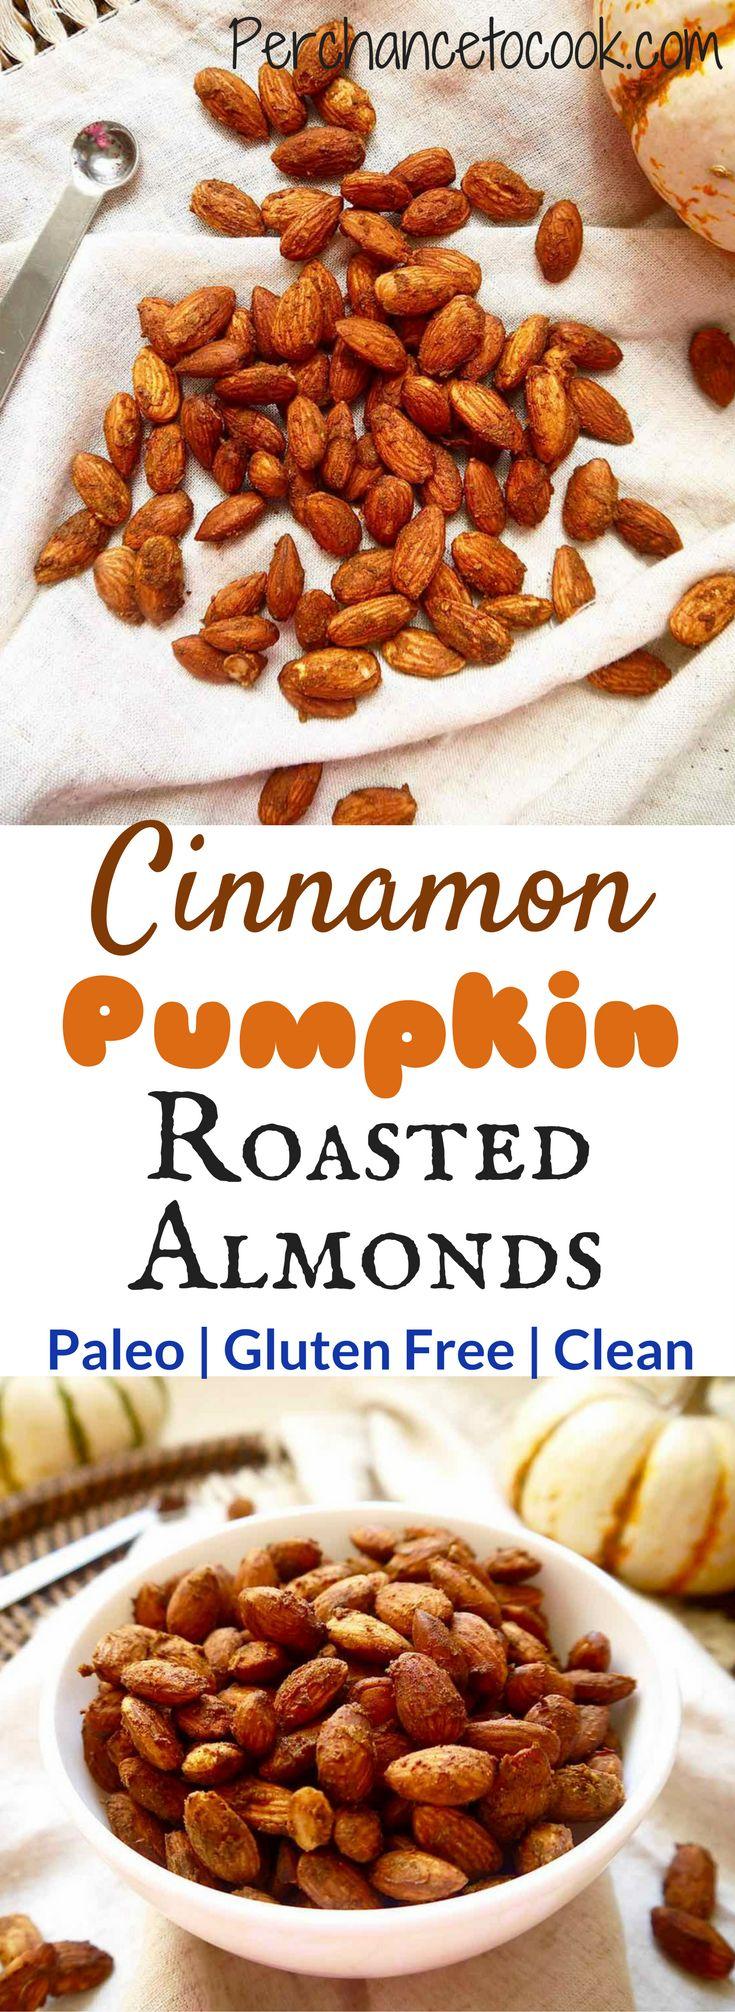 Cinnamon Pumpkin Roasted Almonds {Paleo, GF} | Perchance to Cook, www.perchancetocook.com